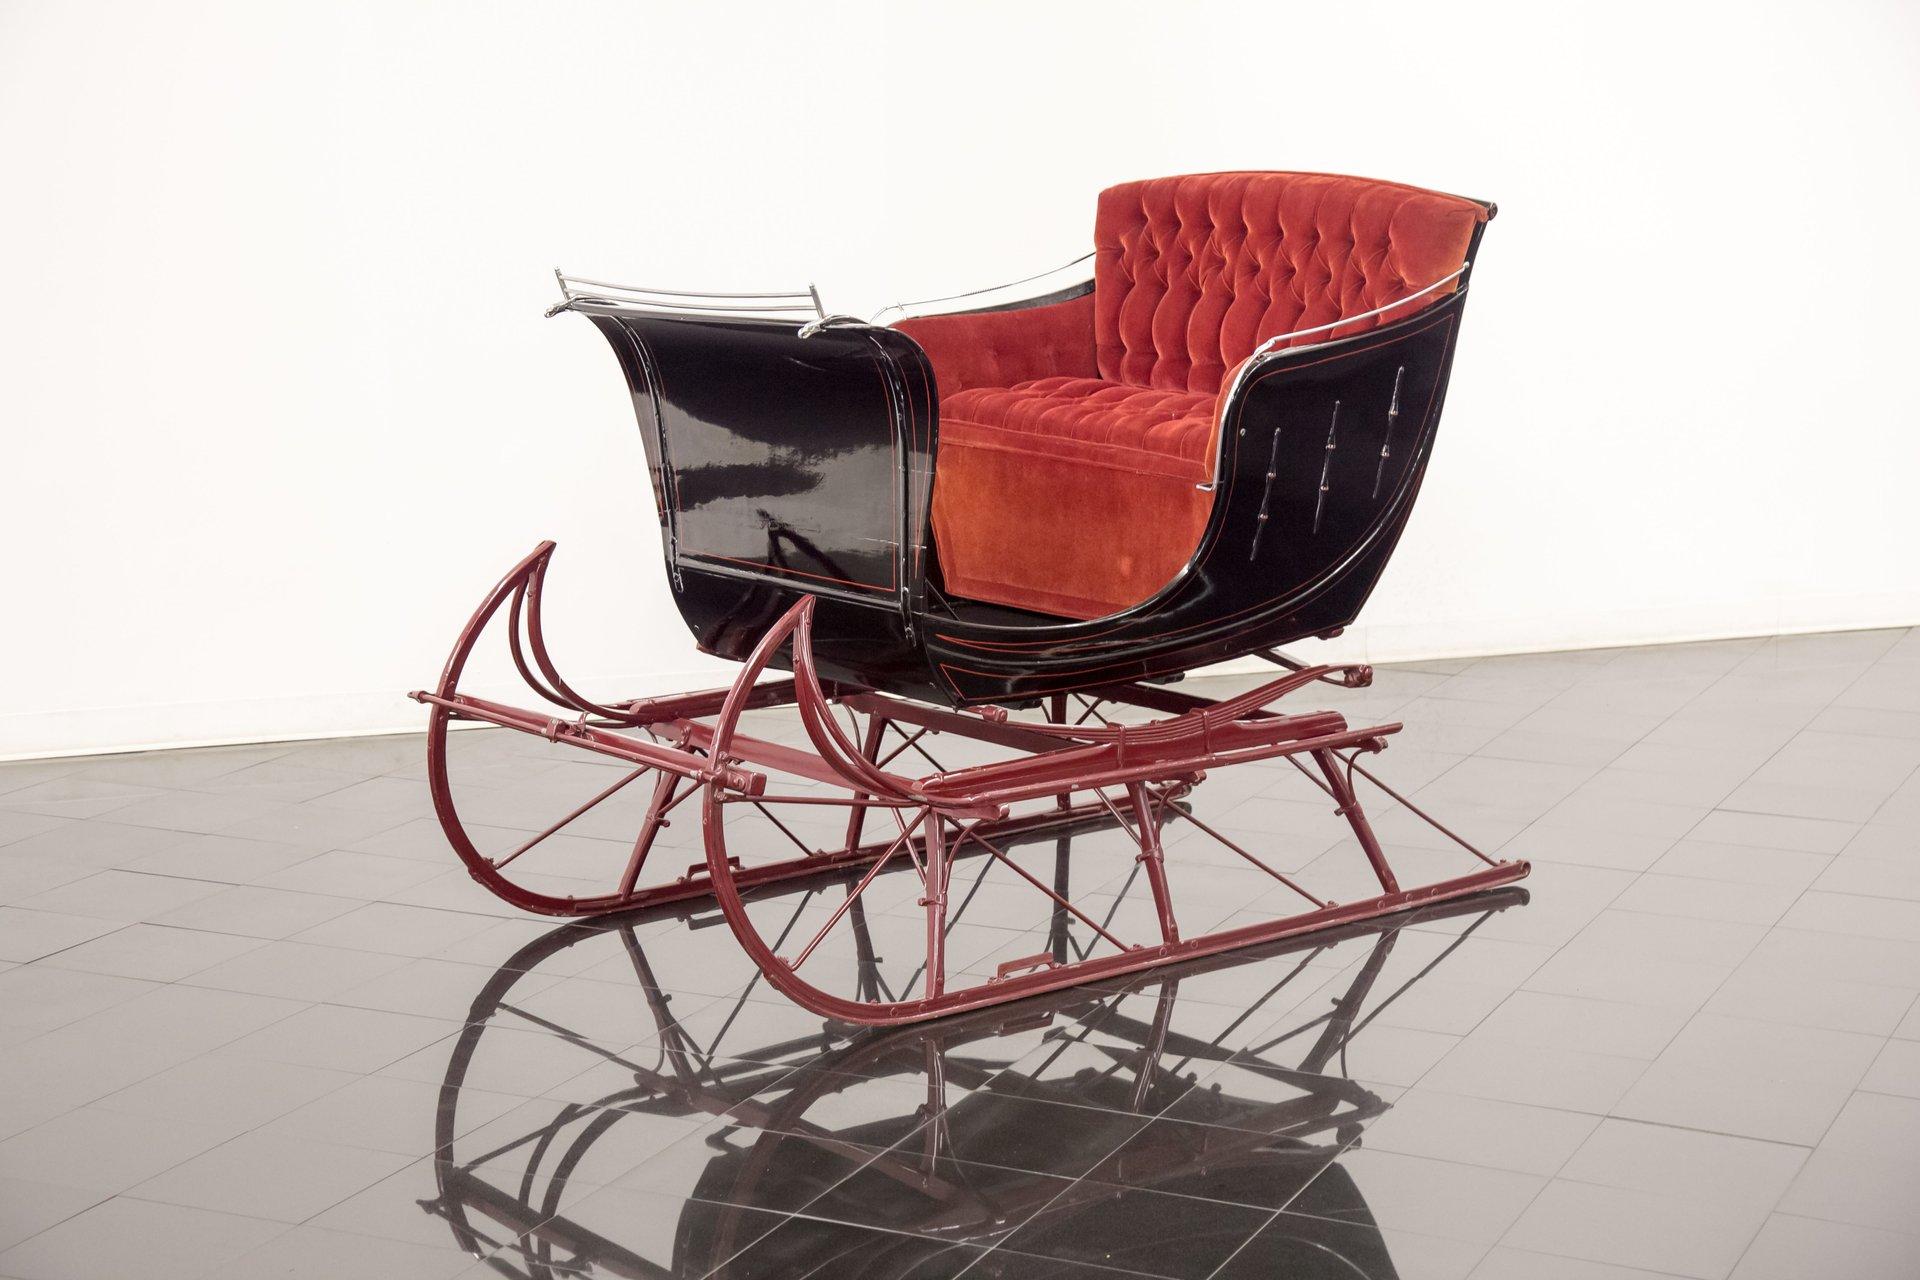 Owosso carriage sleigh co portland cutter sleigh